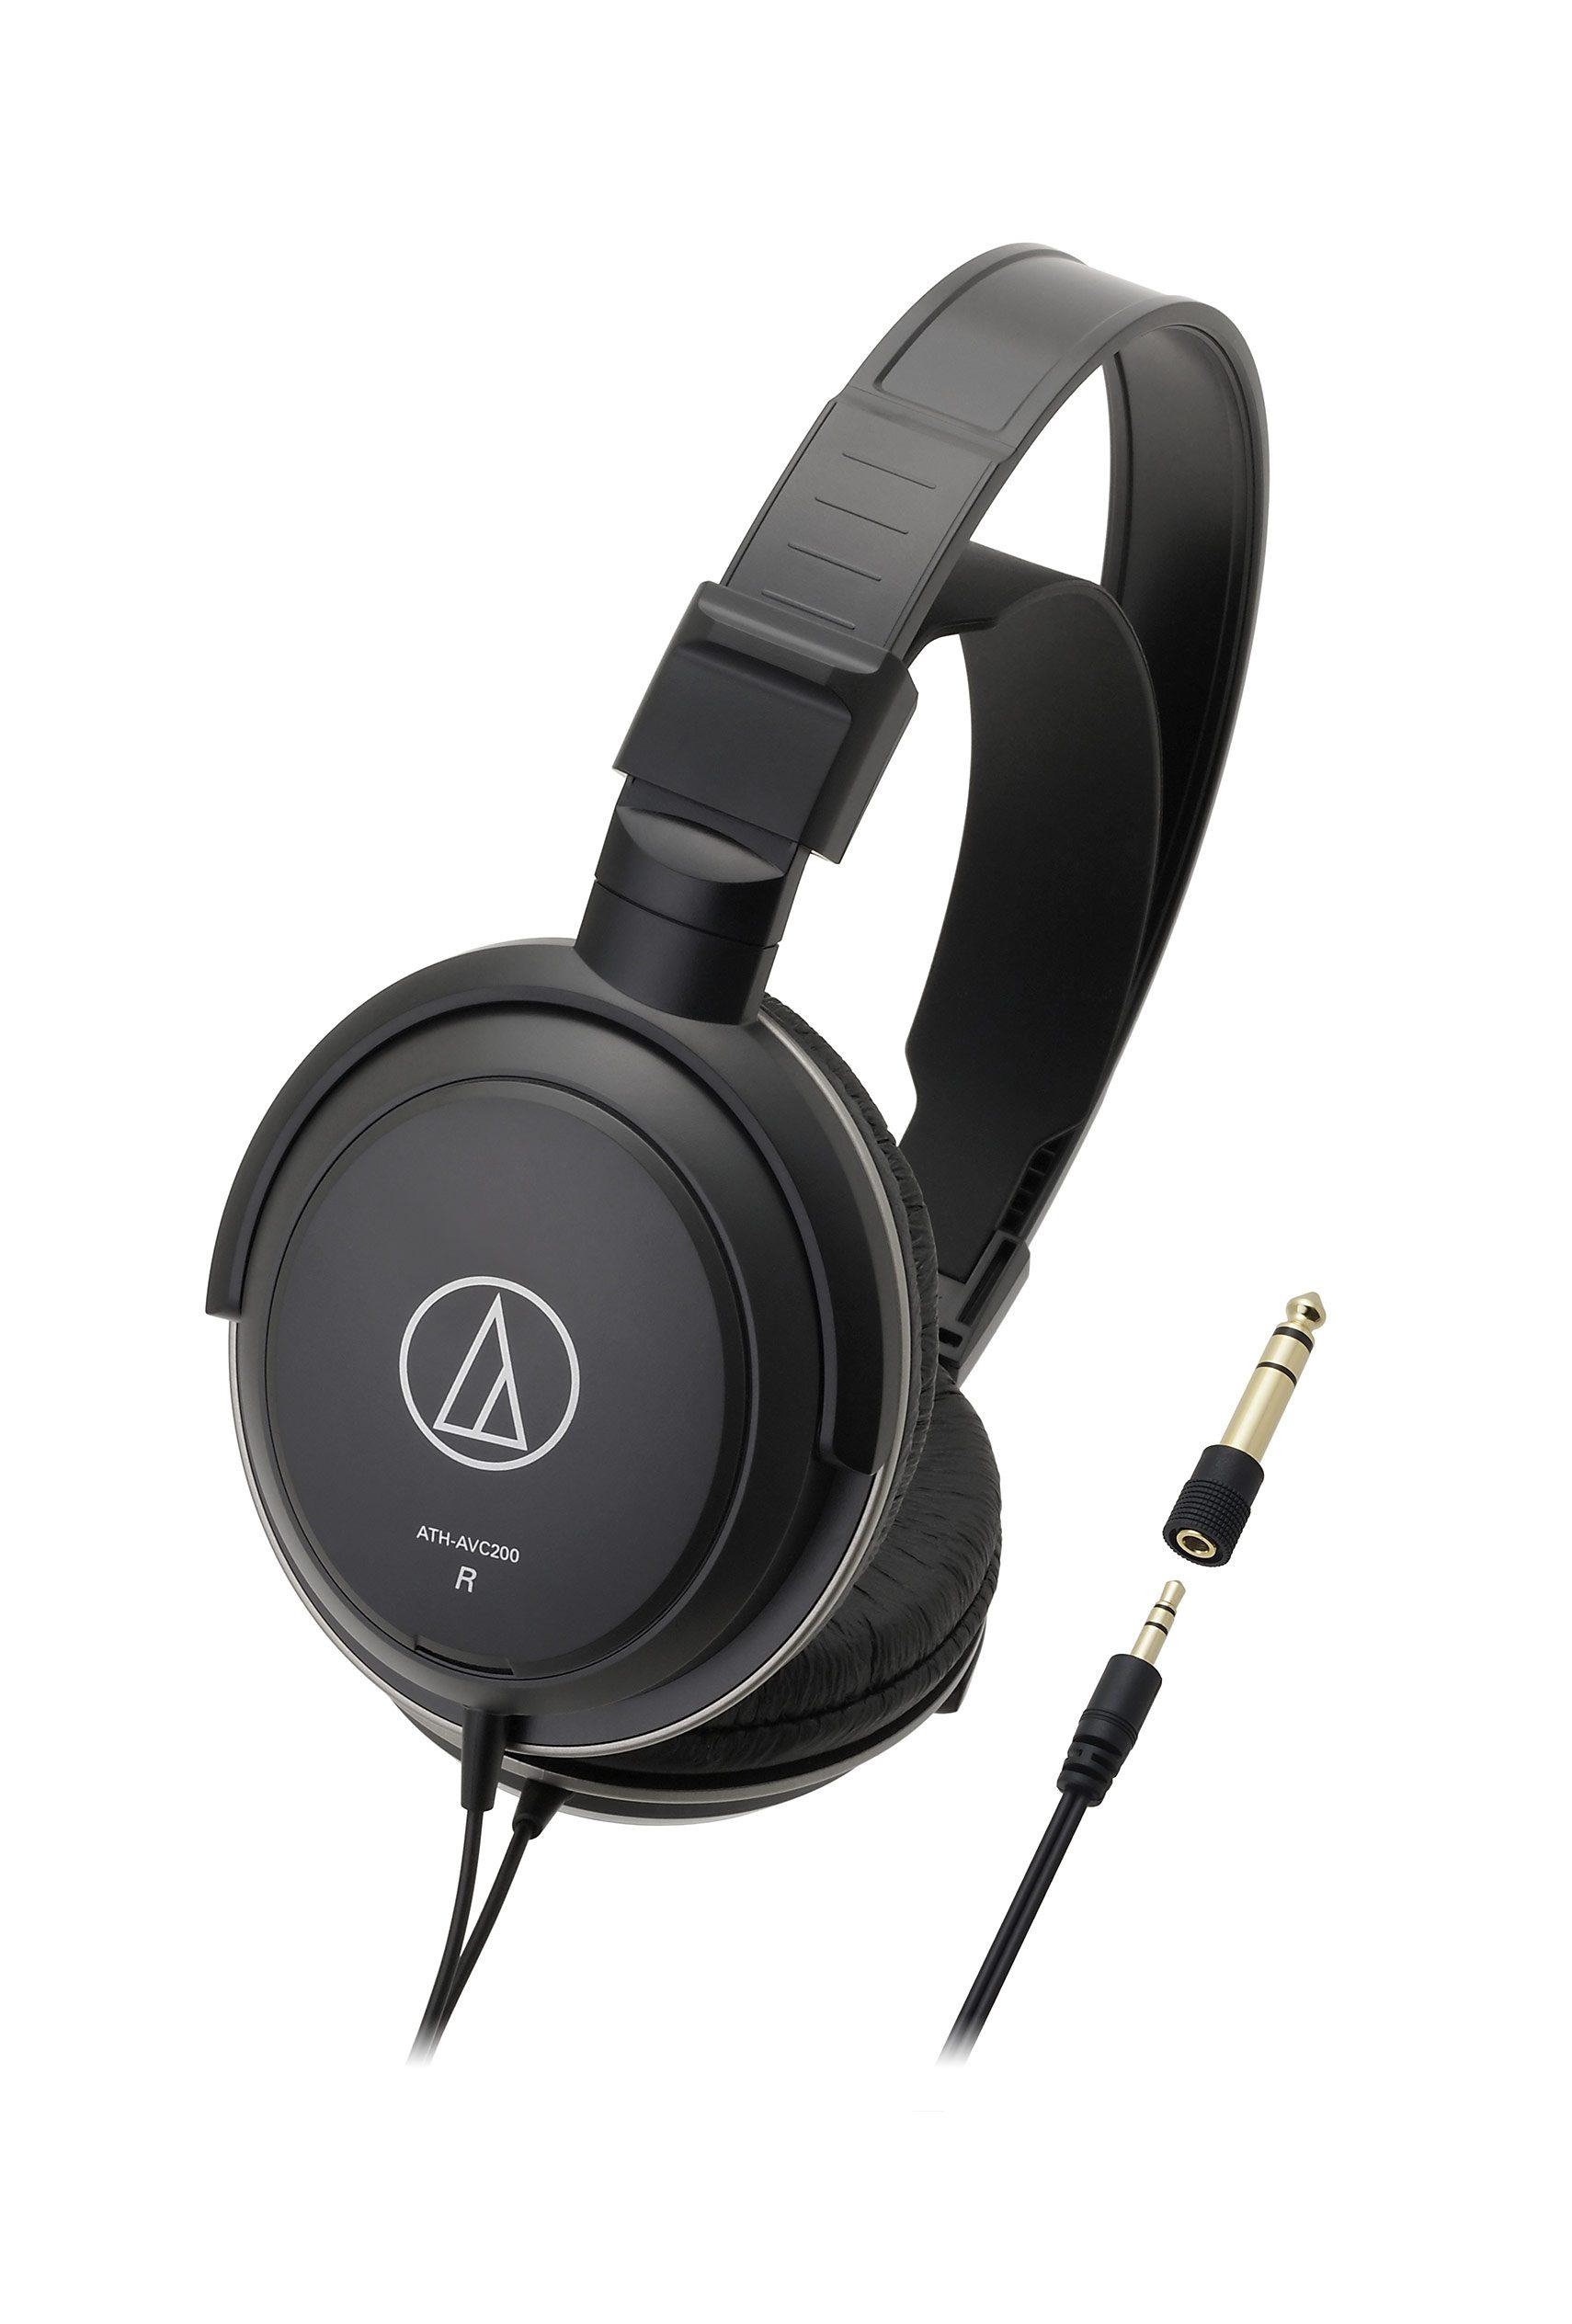 Audio-Technica Kopfhörer »ATH-AVC200«